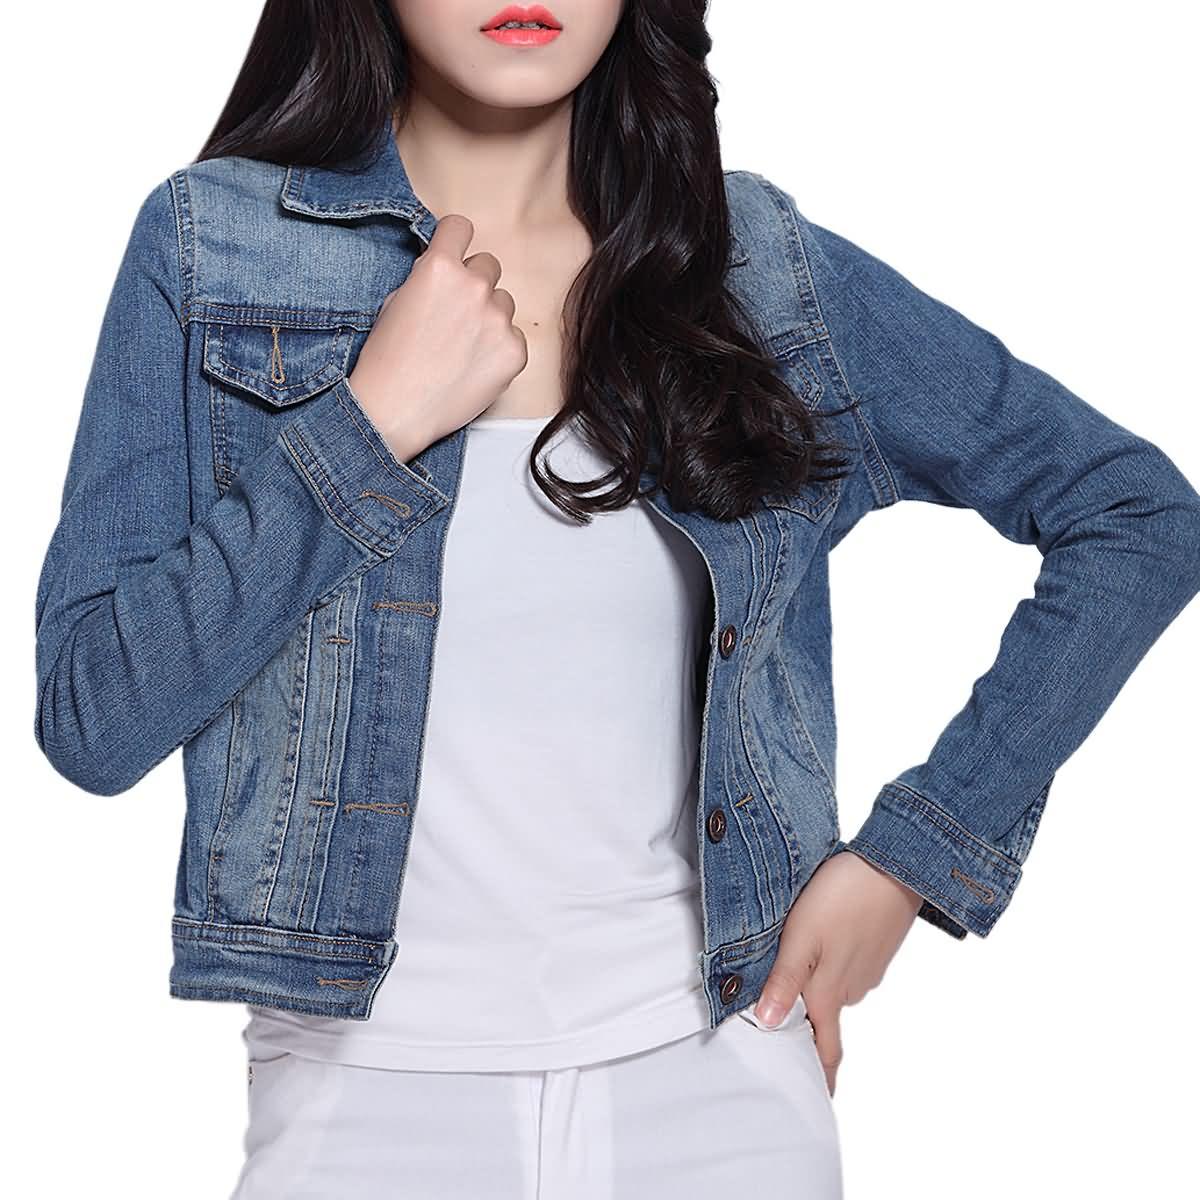 Women Short   Basic   Jeans   Jacket   Coat Bleach Long Sleeves Single Breast Slim Women Cowboy Denim   Jacket   Topcoat Cardigan On Sale